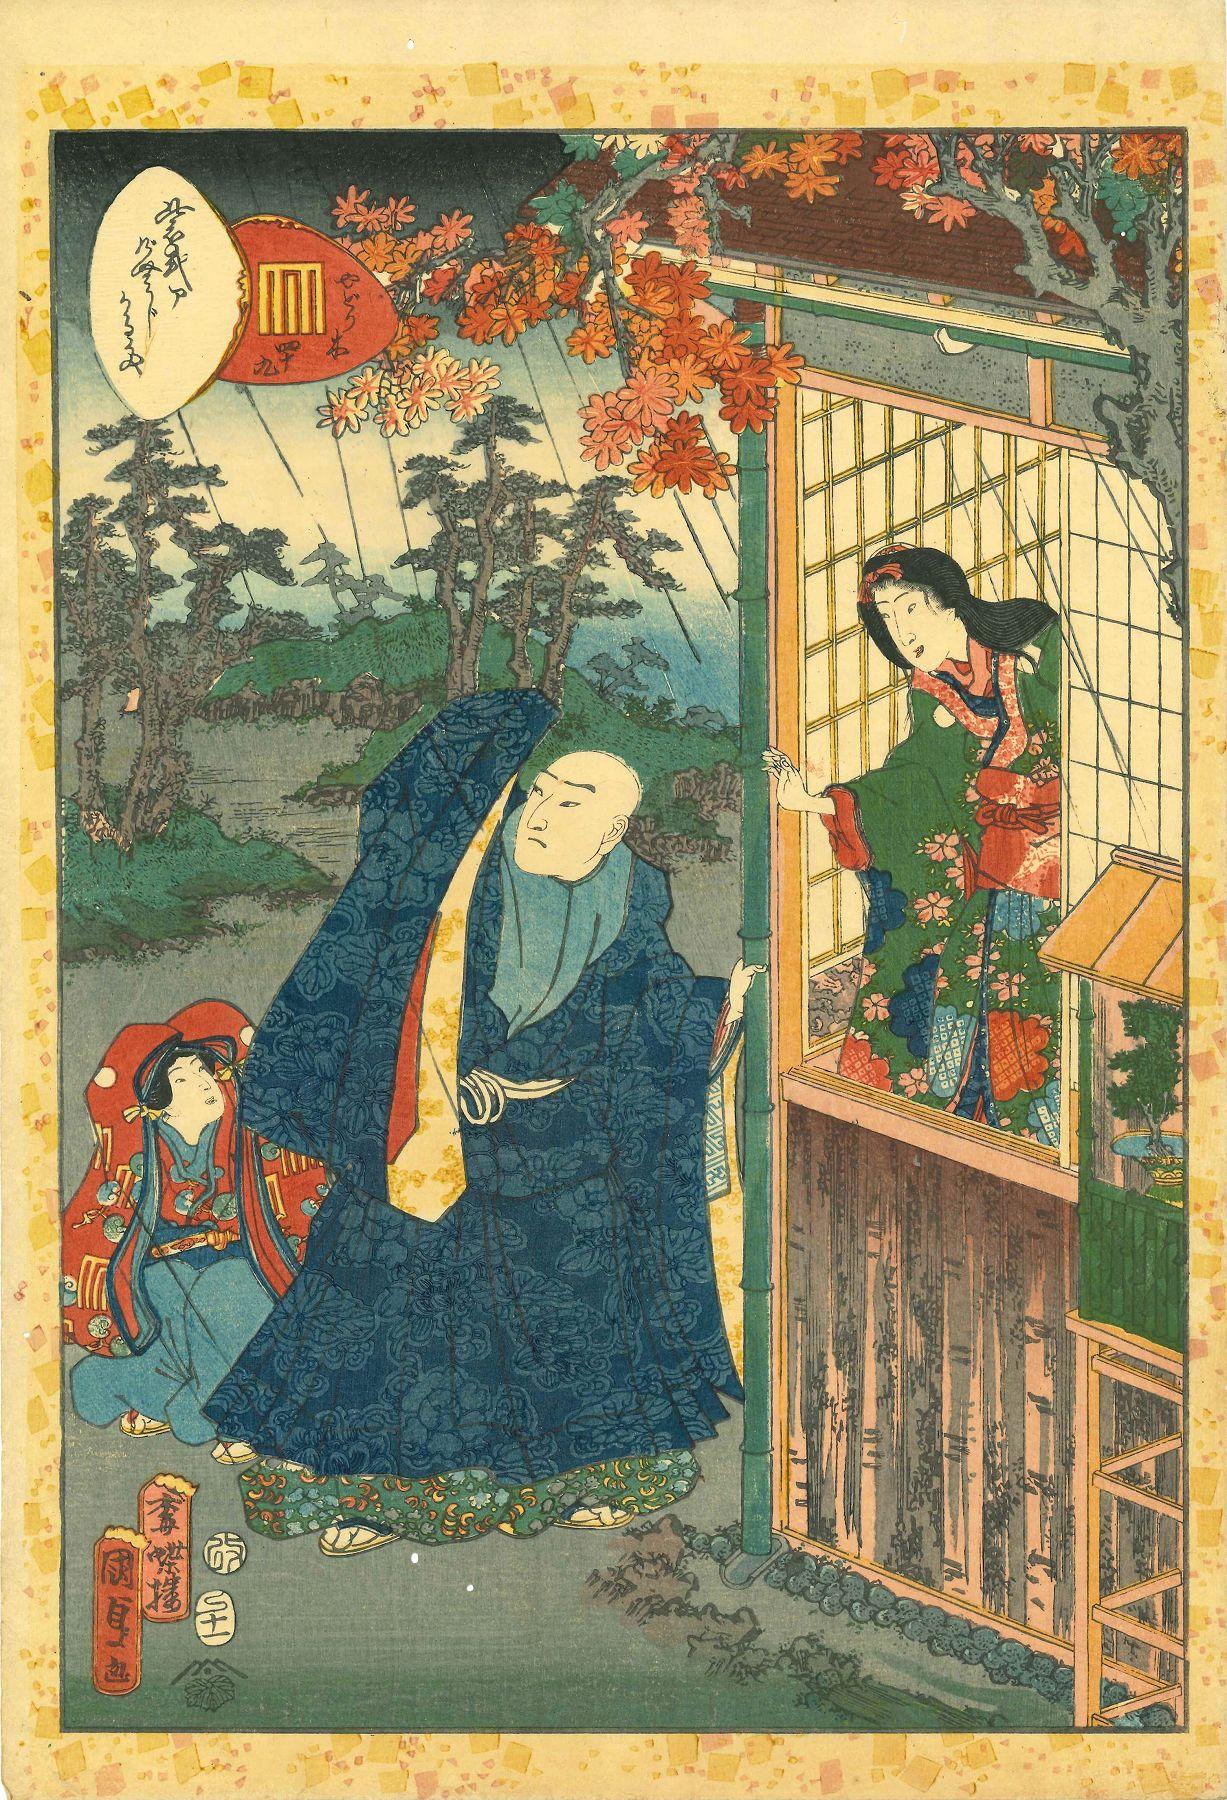 KUNISADA II <i>Yadorigi</i>, Chapter 49, from <i>Murasaki Shikibu Genji karuta</i> (Card game of the tale of Genji by Lady Murasaki)